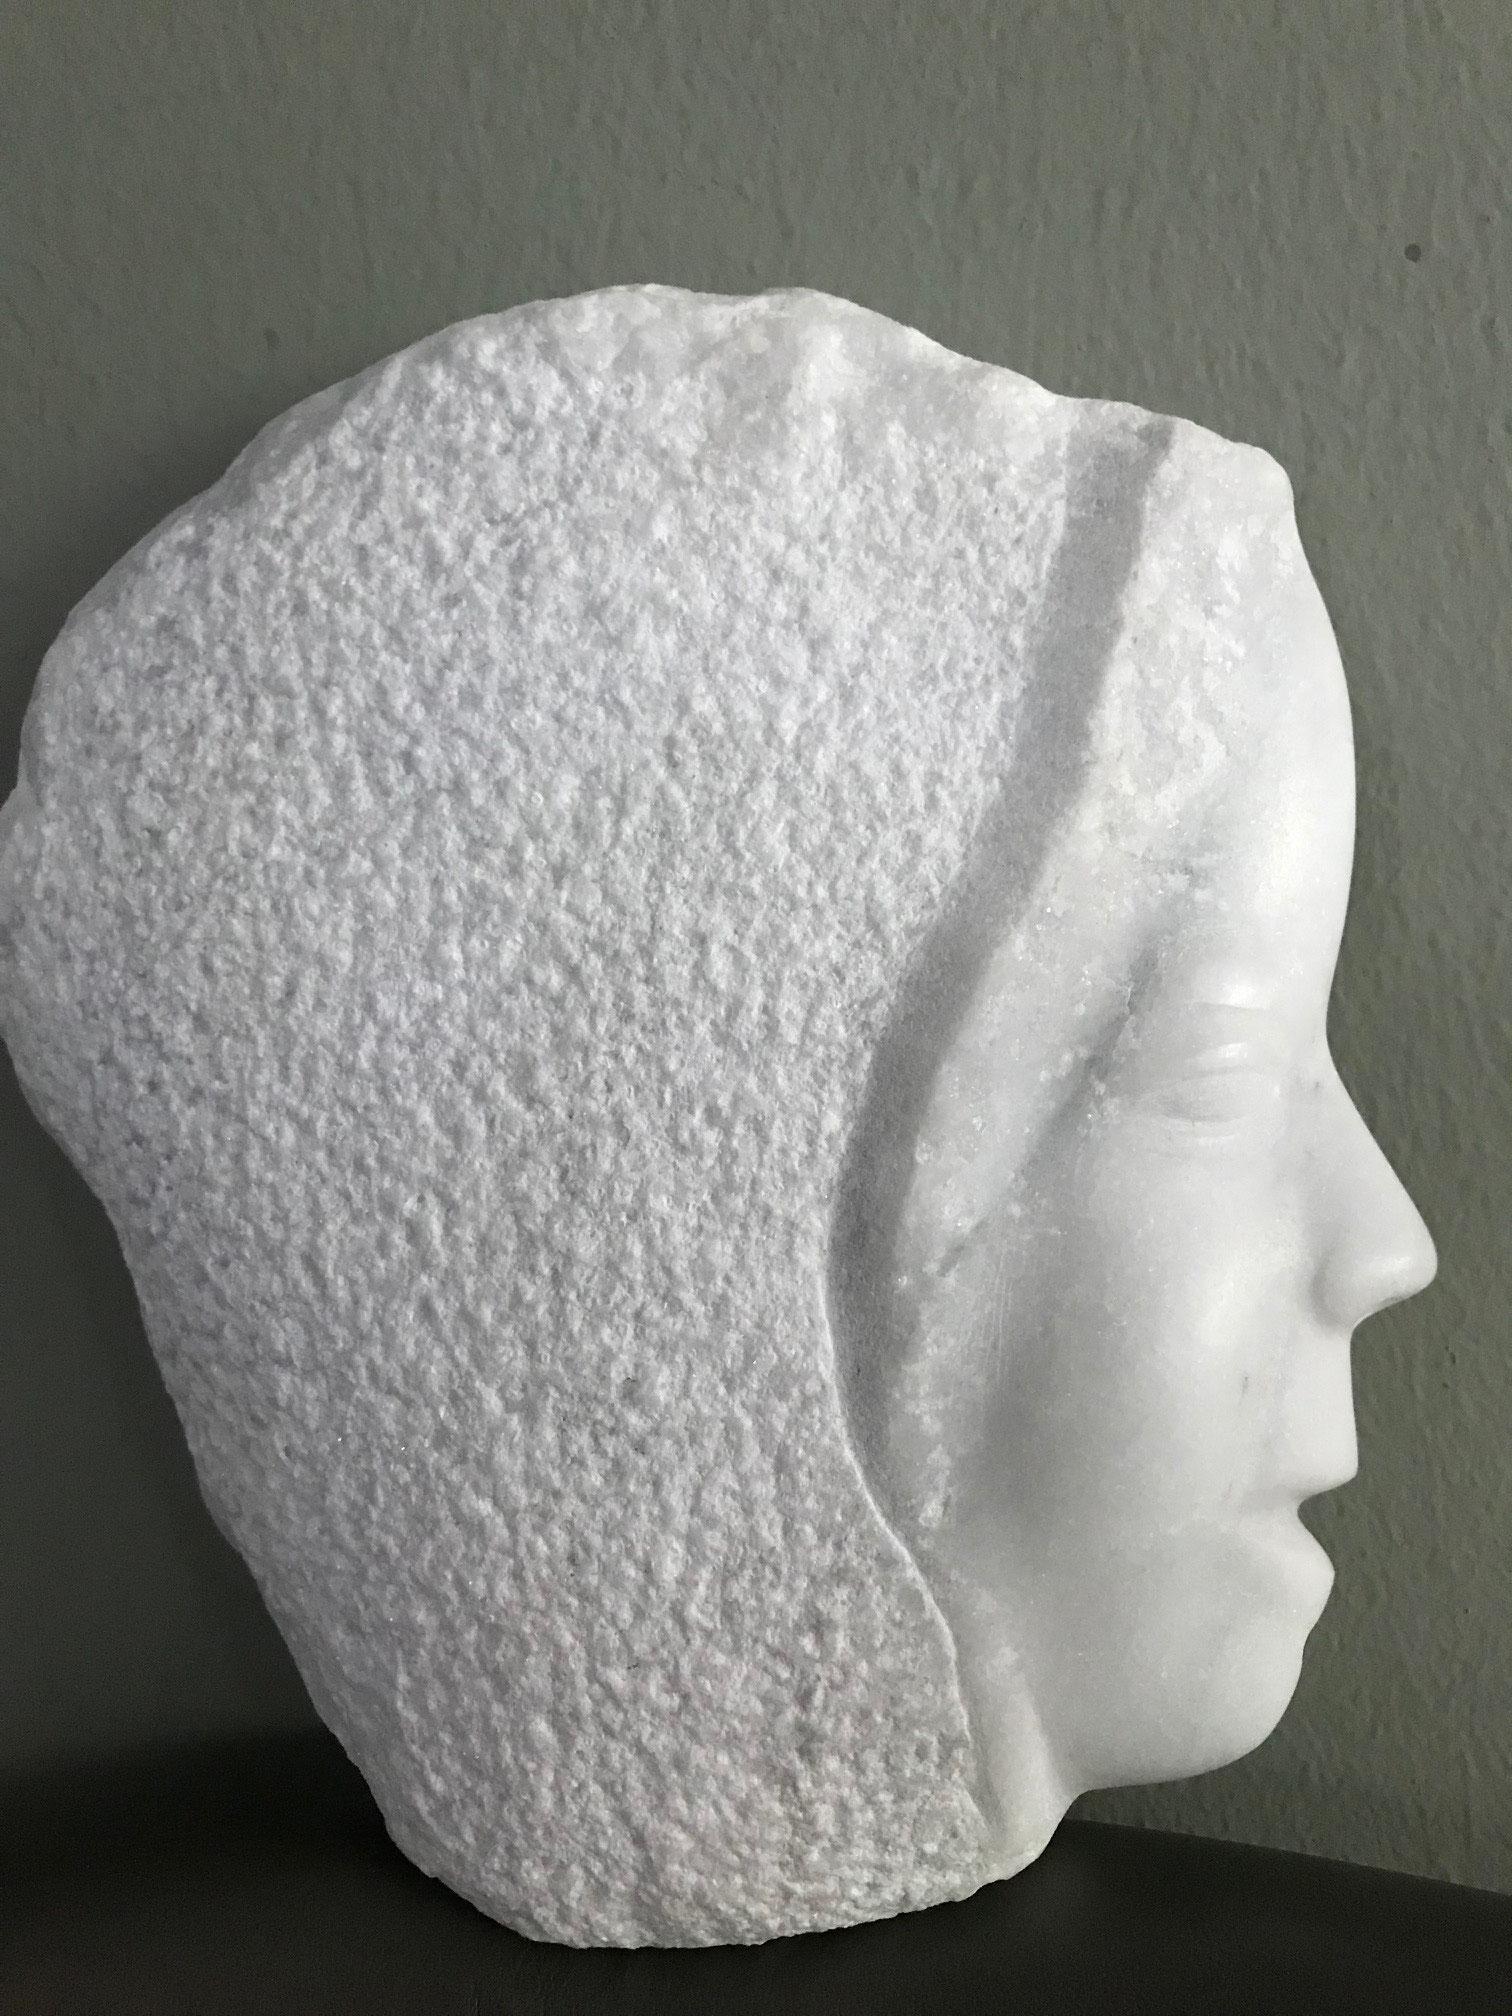 """Kindskopf"", Carrara Marmor, 26 cm x 13 cm, © Susanne Musfeldt-Gohm, 2019"